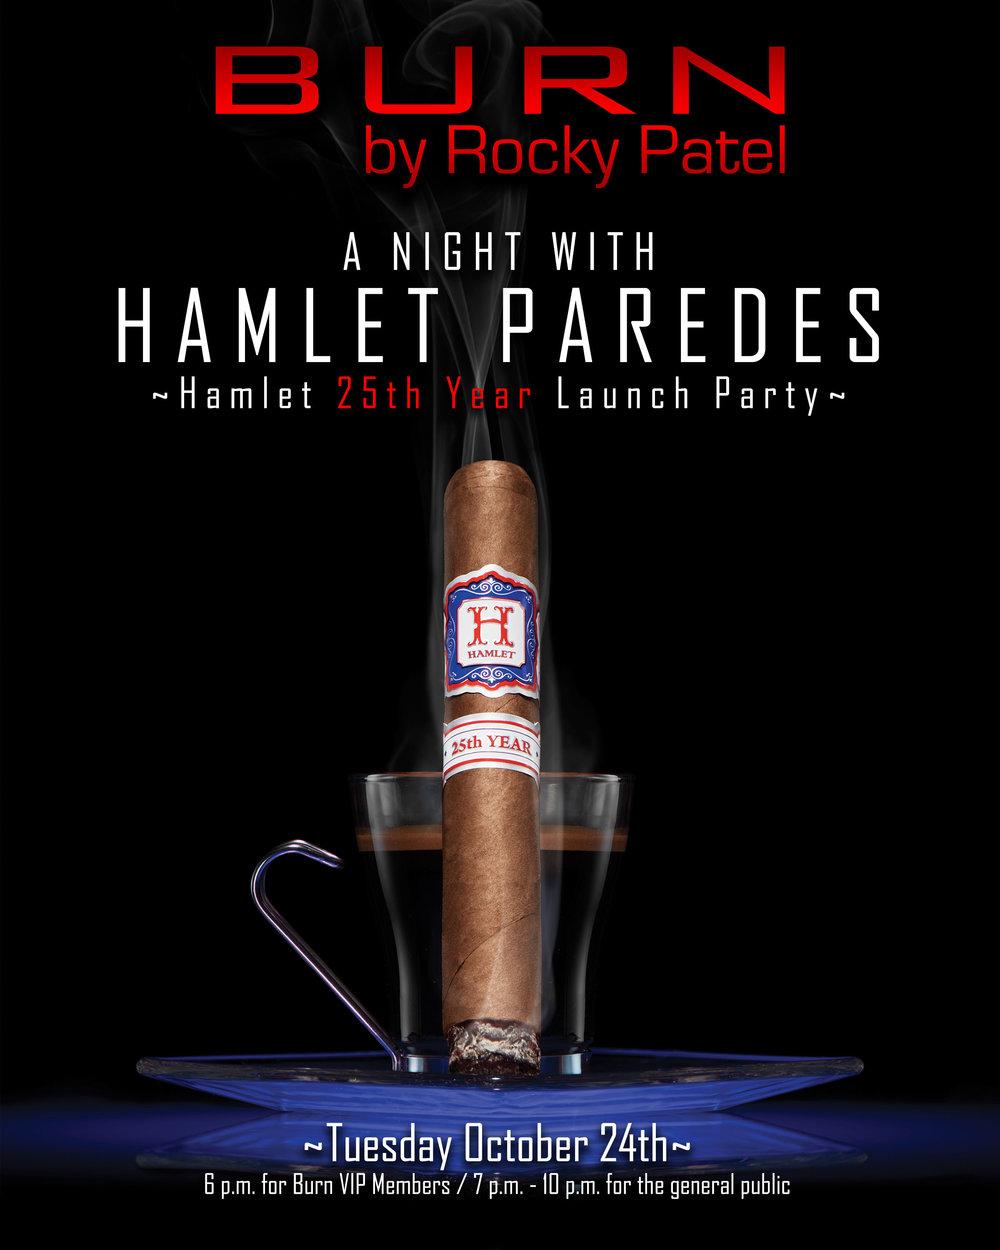 Hamlet Paredes Launch Party